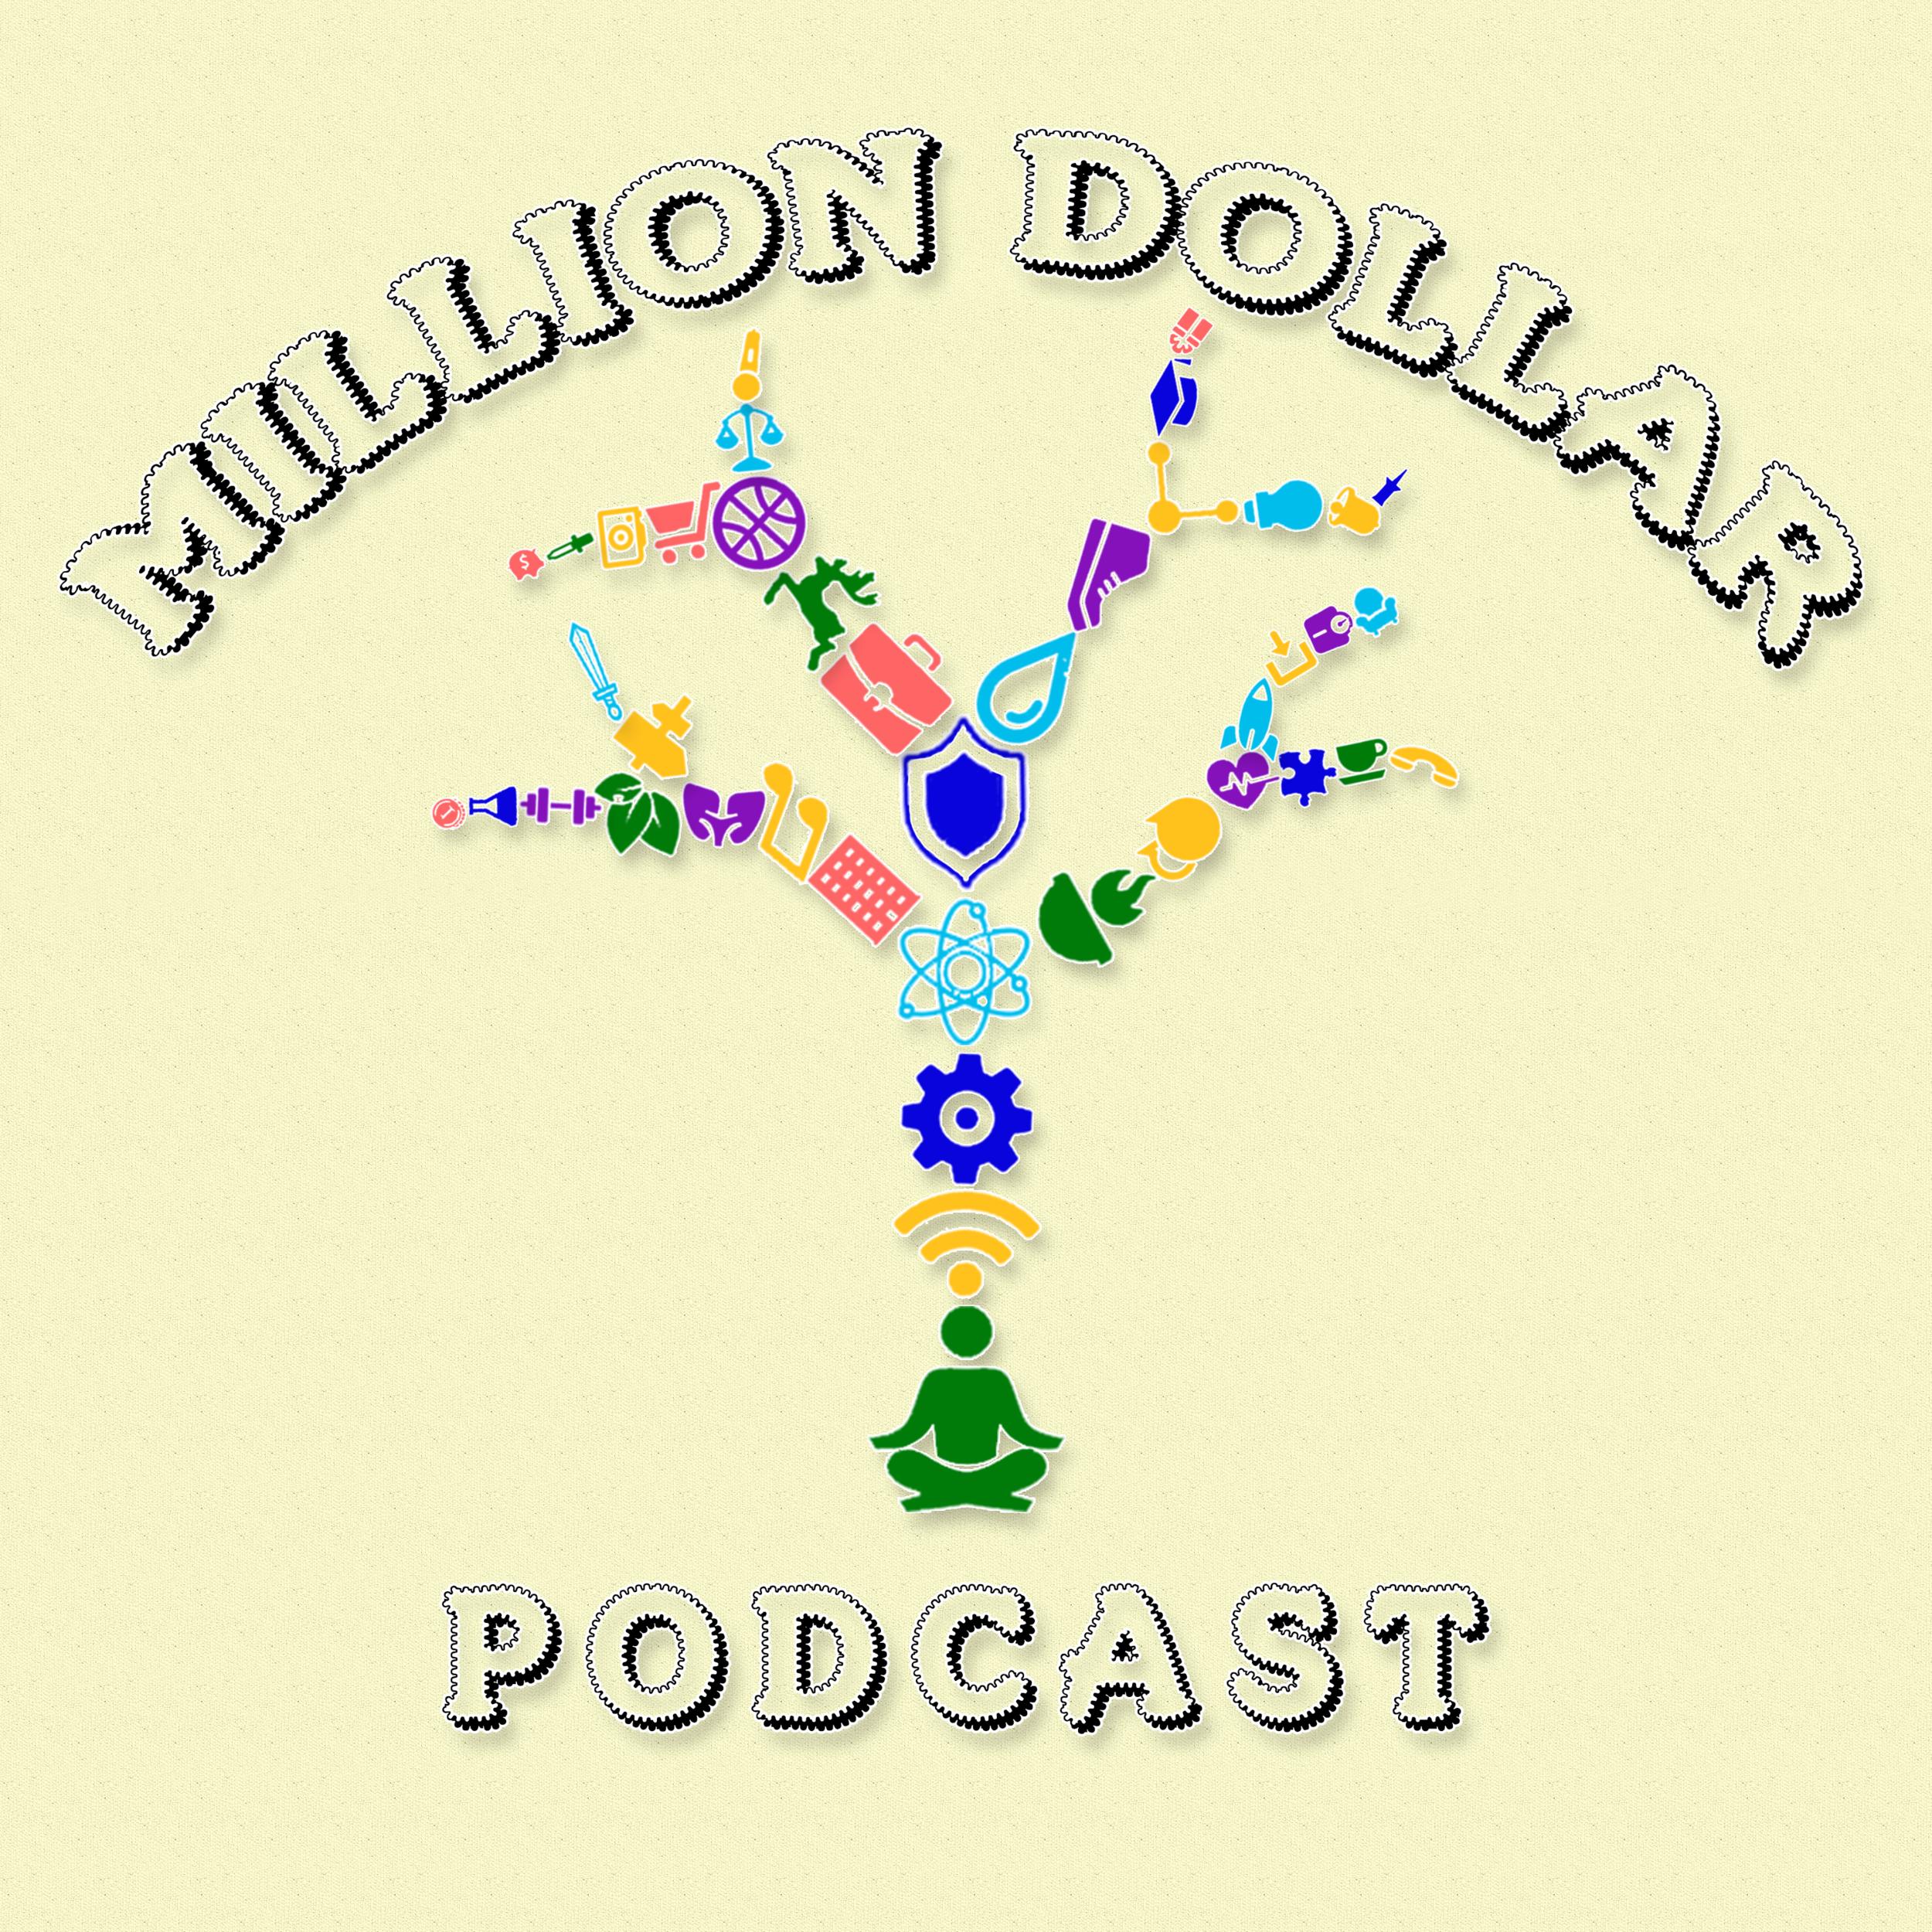 Million Dollar Podcast 3000x3000.png